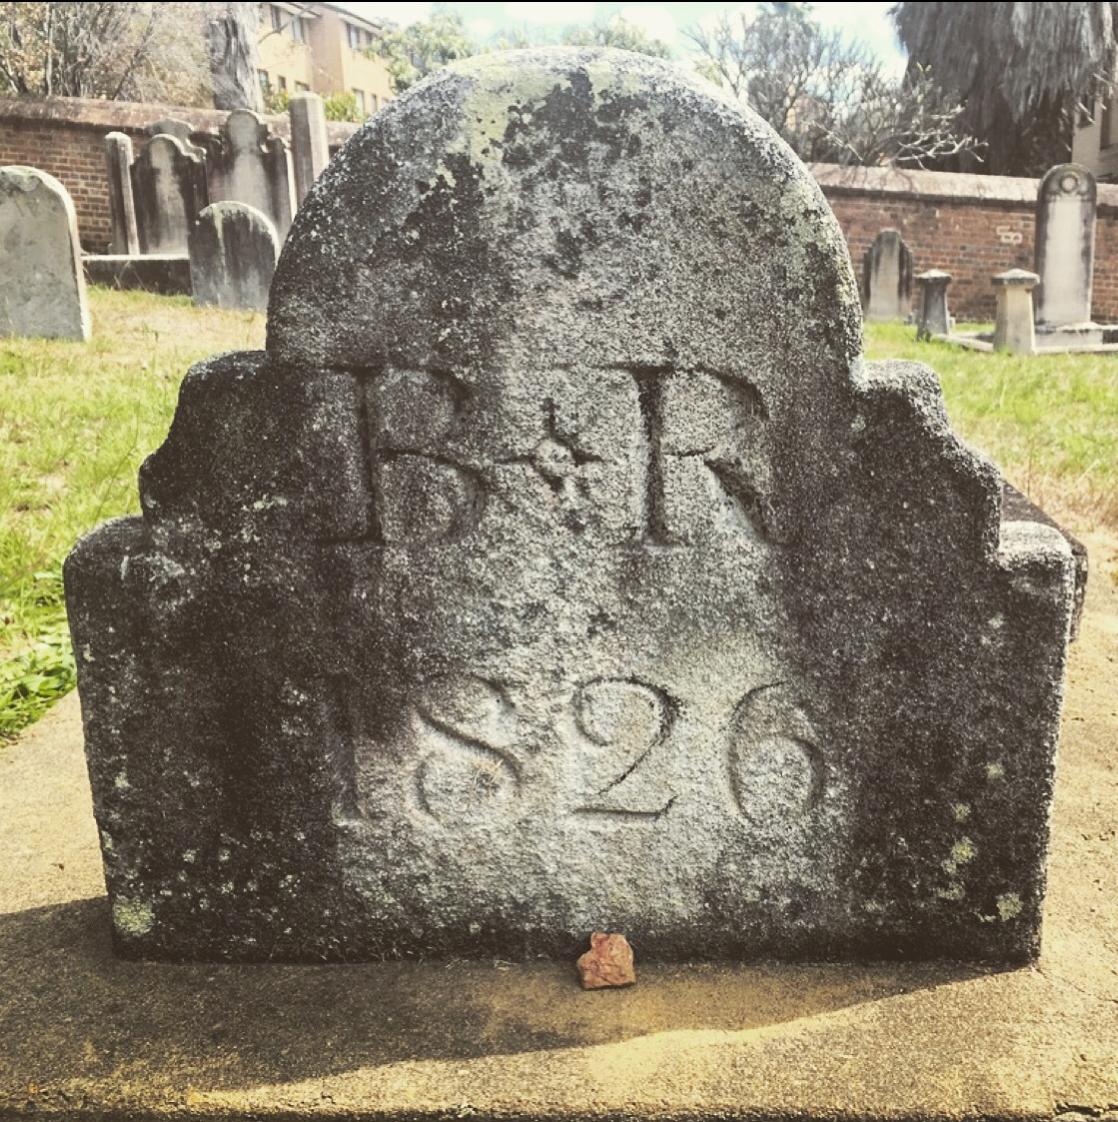 Benjamin Ratty, Convict Constable, Convict, St. John's Cemetery, Parramatta, Marine Society, St. John's Cemetery Project, Old Parramattans, New South Wales Constables, Killed in the Line of Duty, Bushrangers, 1820s, nineteenth century